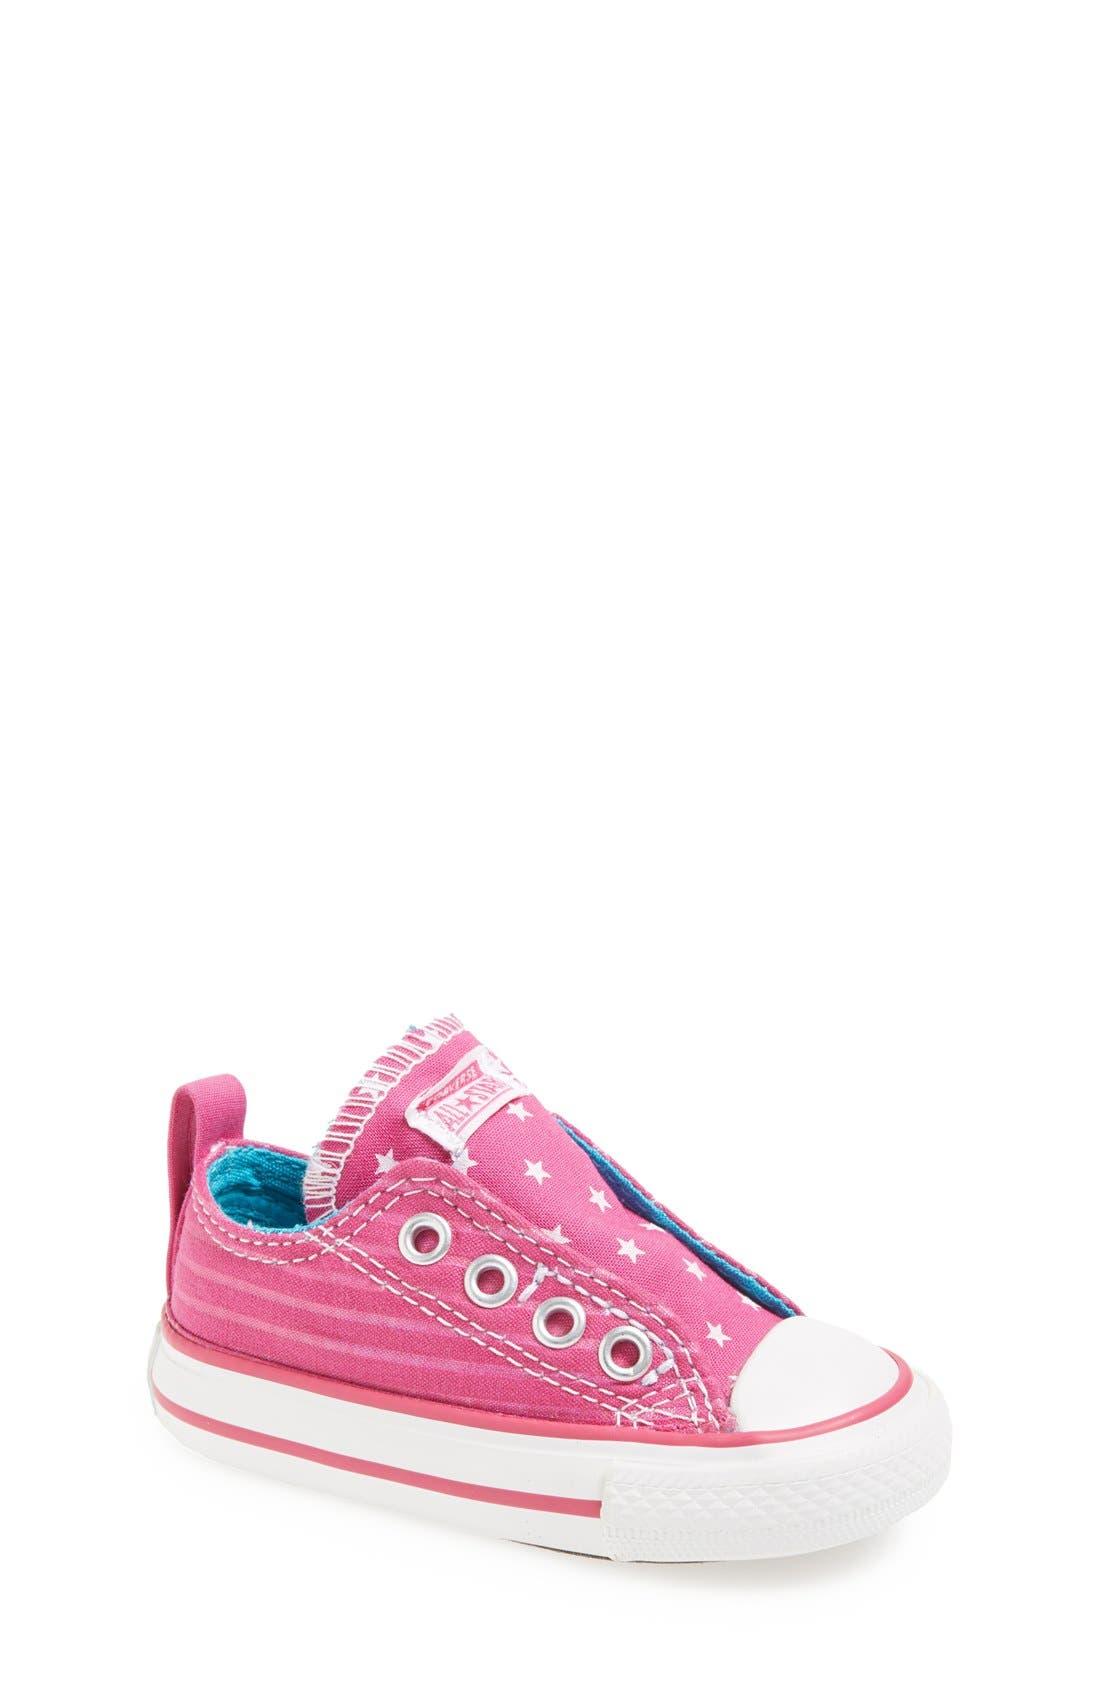 Alternate Image 1 Selected - Converse All Star® Slip-On Sneaker (Baby, Walker & Toddler)